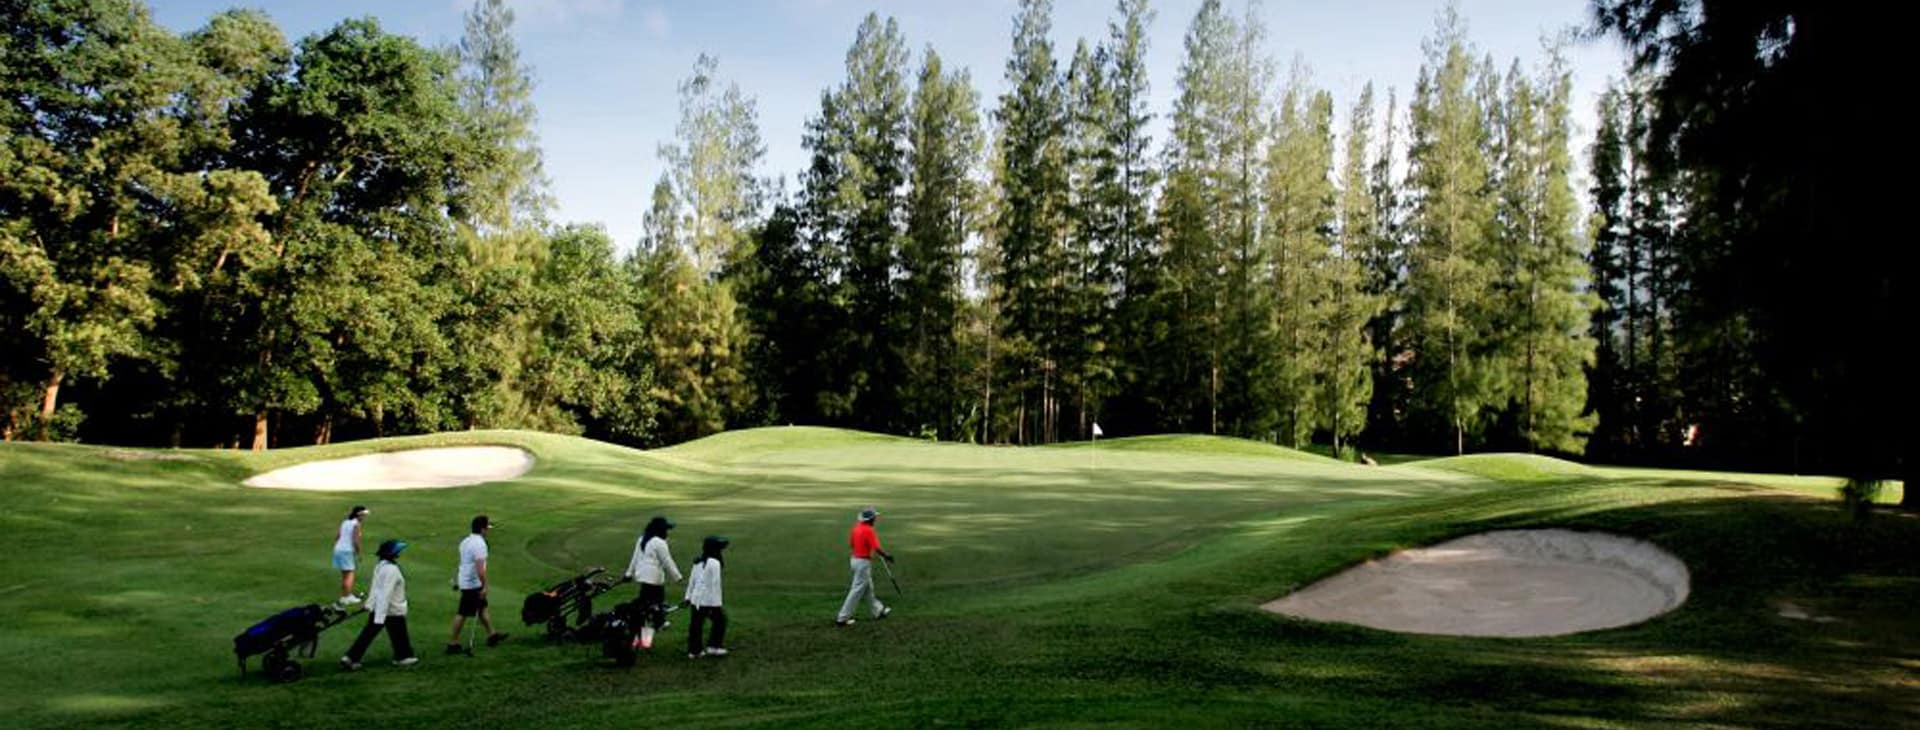 Golf Thailand_Golf Courses_Phuket_Laguna Phuket Golf Club